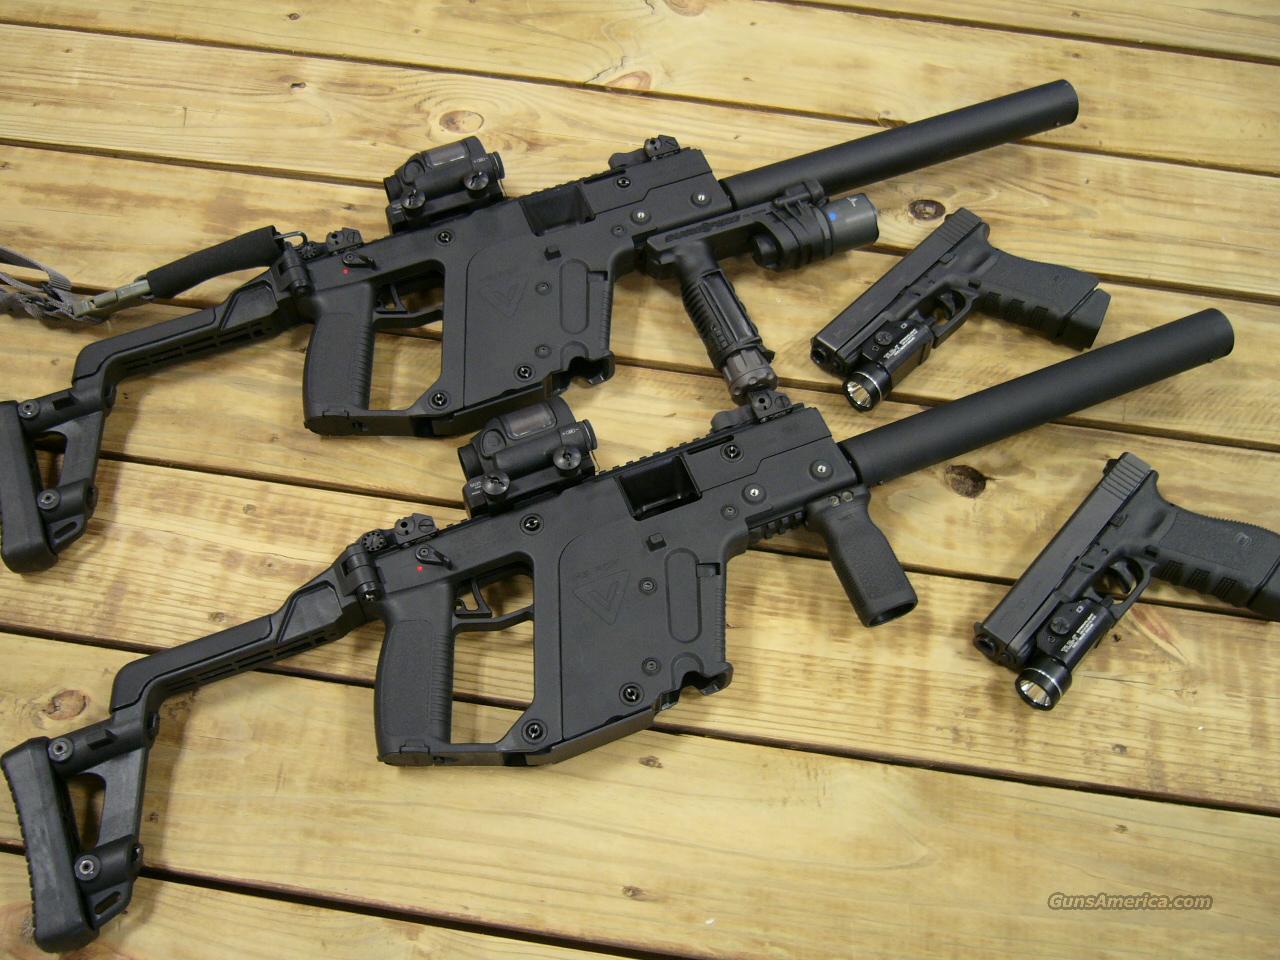 1280x960 Kriss Vector .45 Acp Tactical Carbine Units W ... For Sale